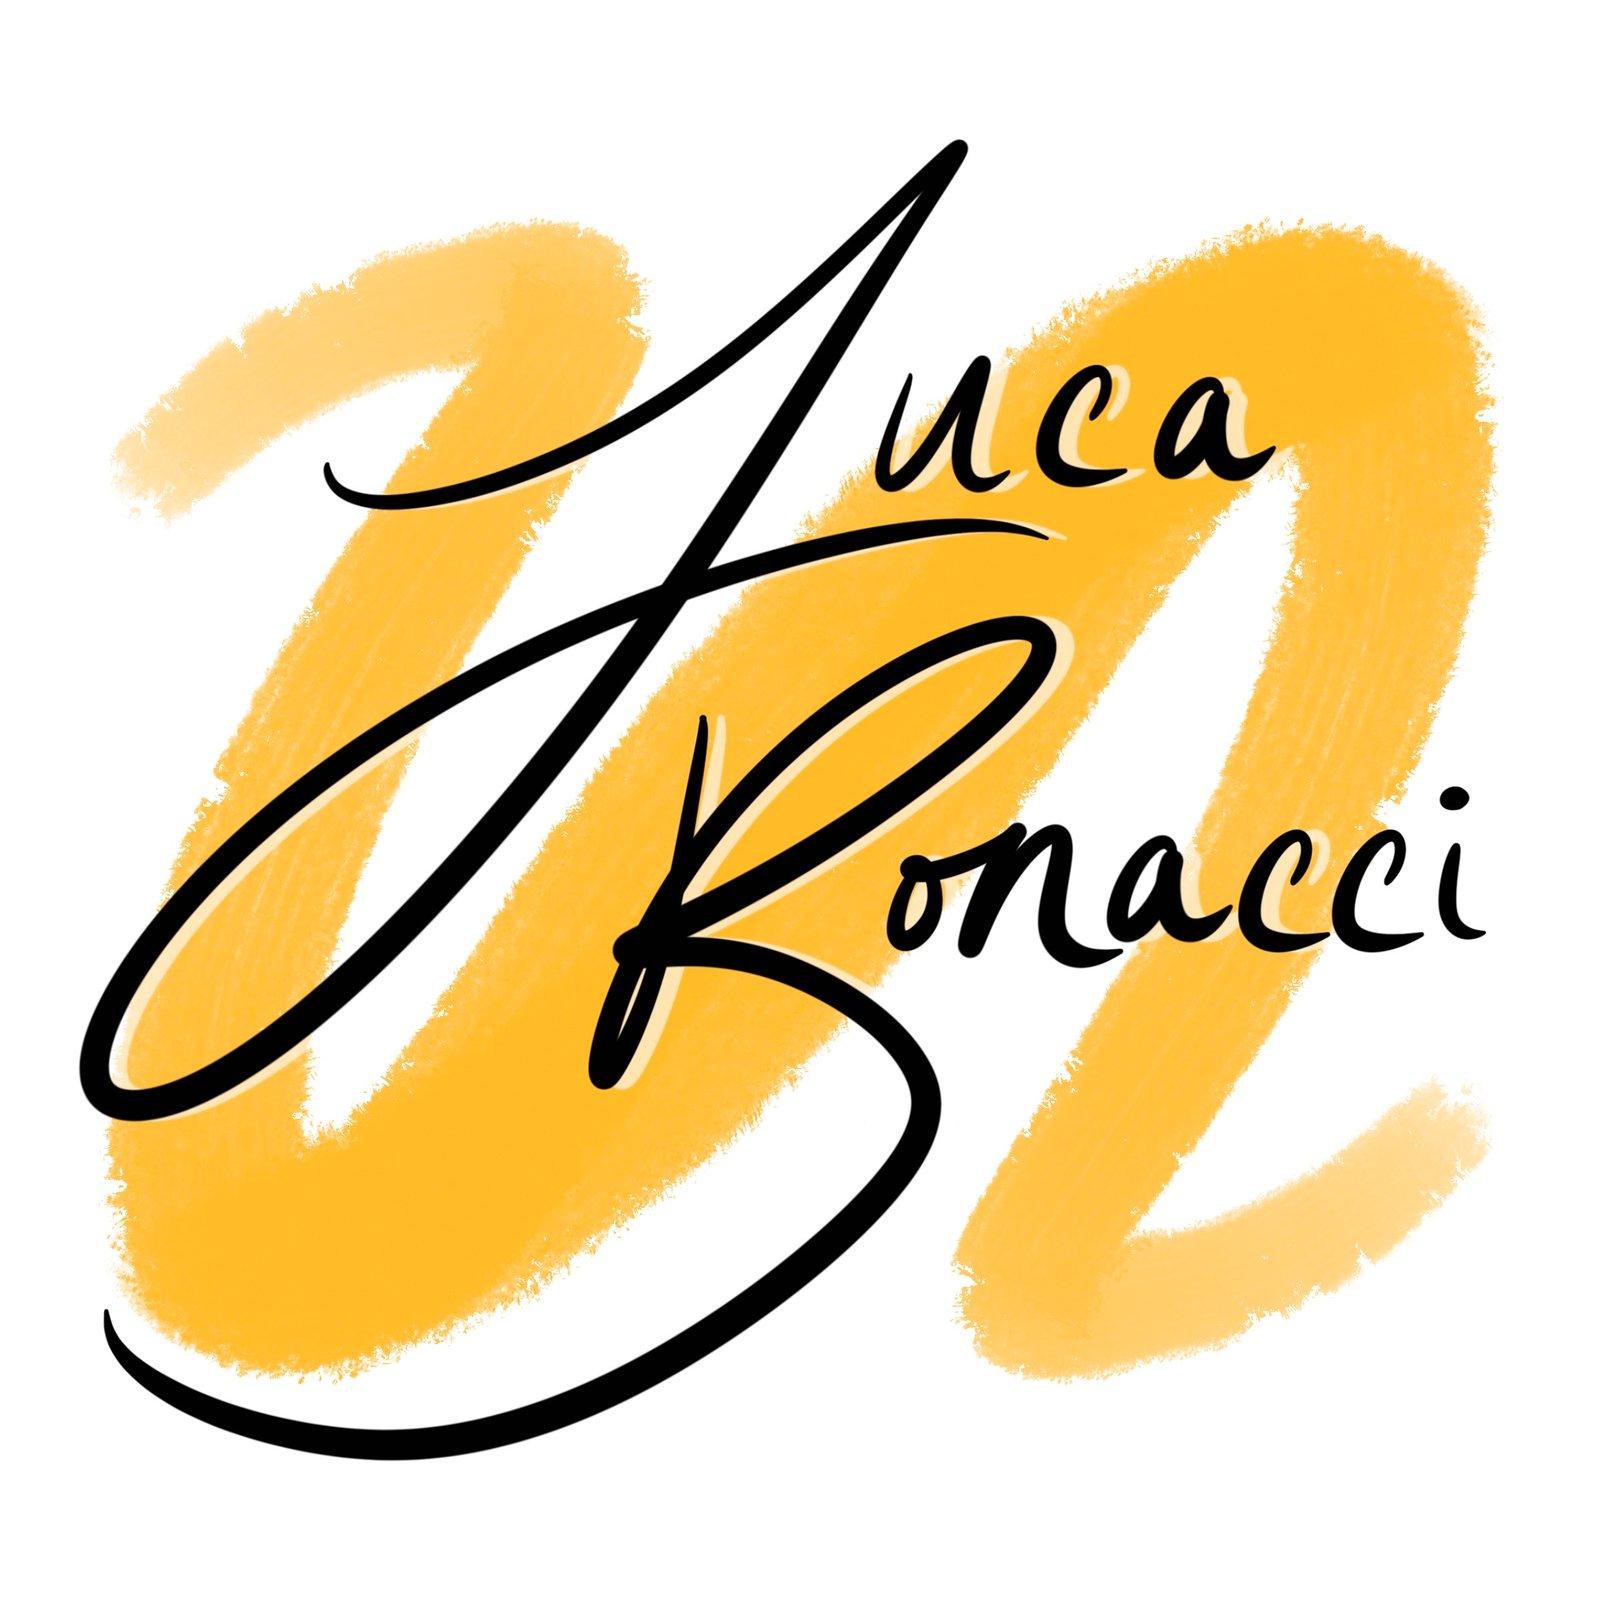 Luca Bonacci's account image